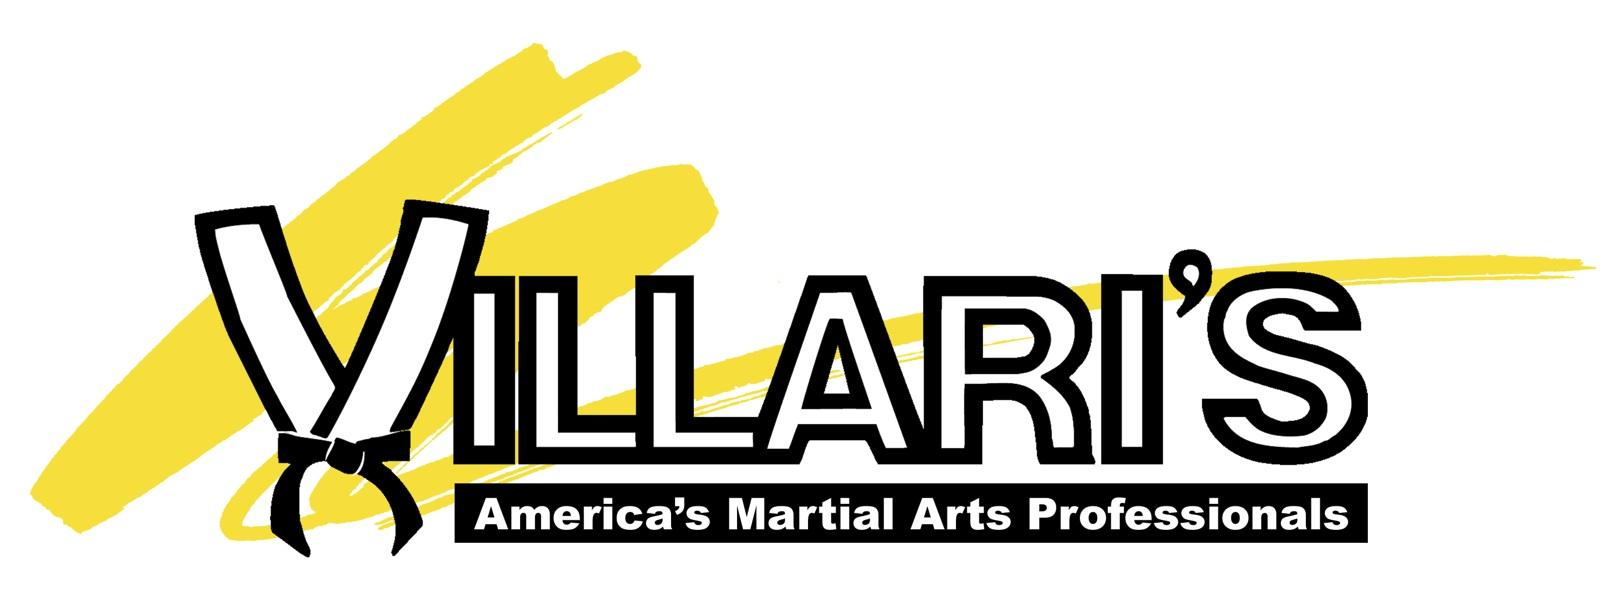 Villari's Martial Arts Centers - Newington CT in Newington, CT, photo #3